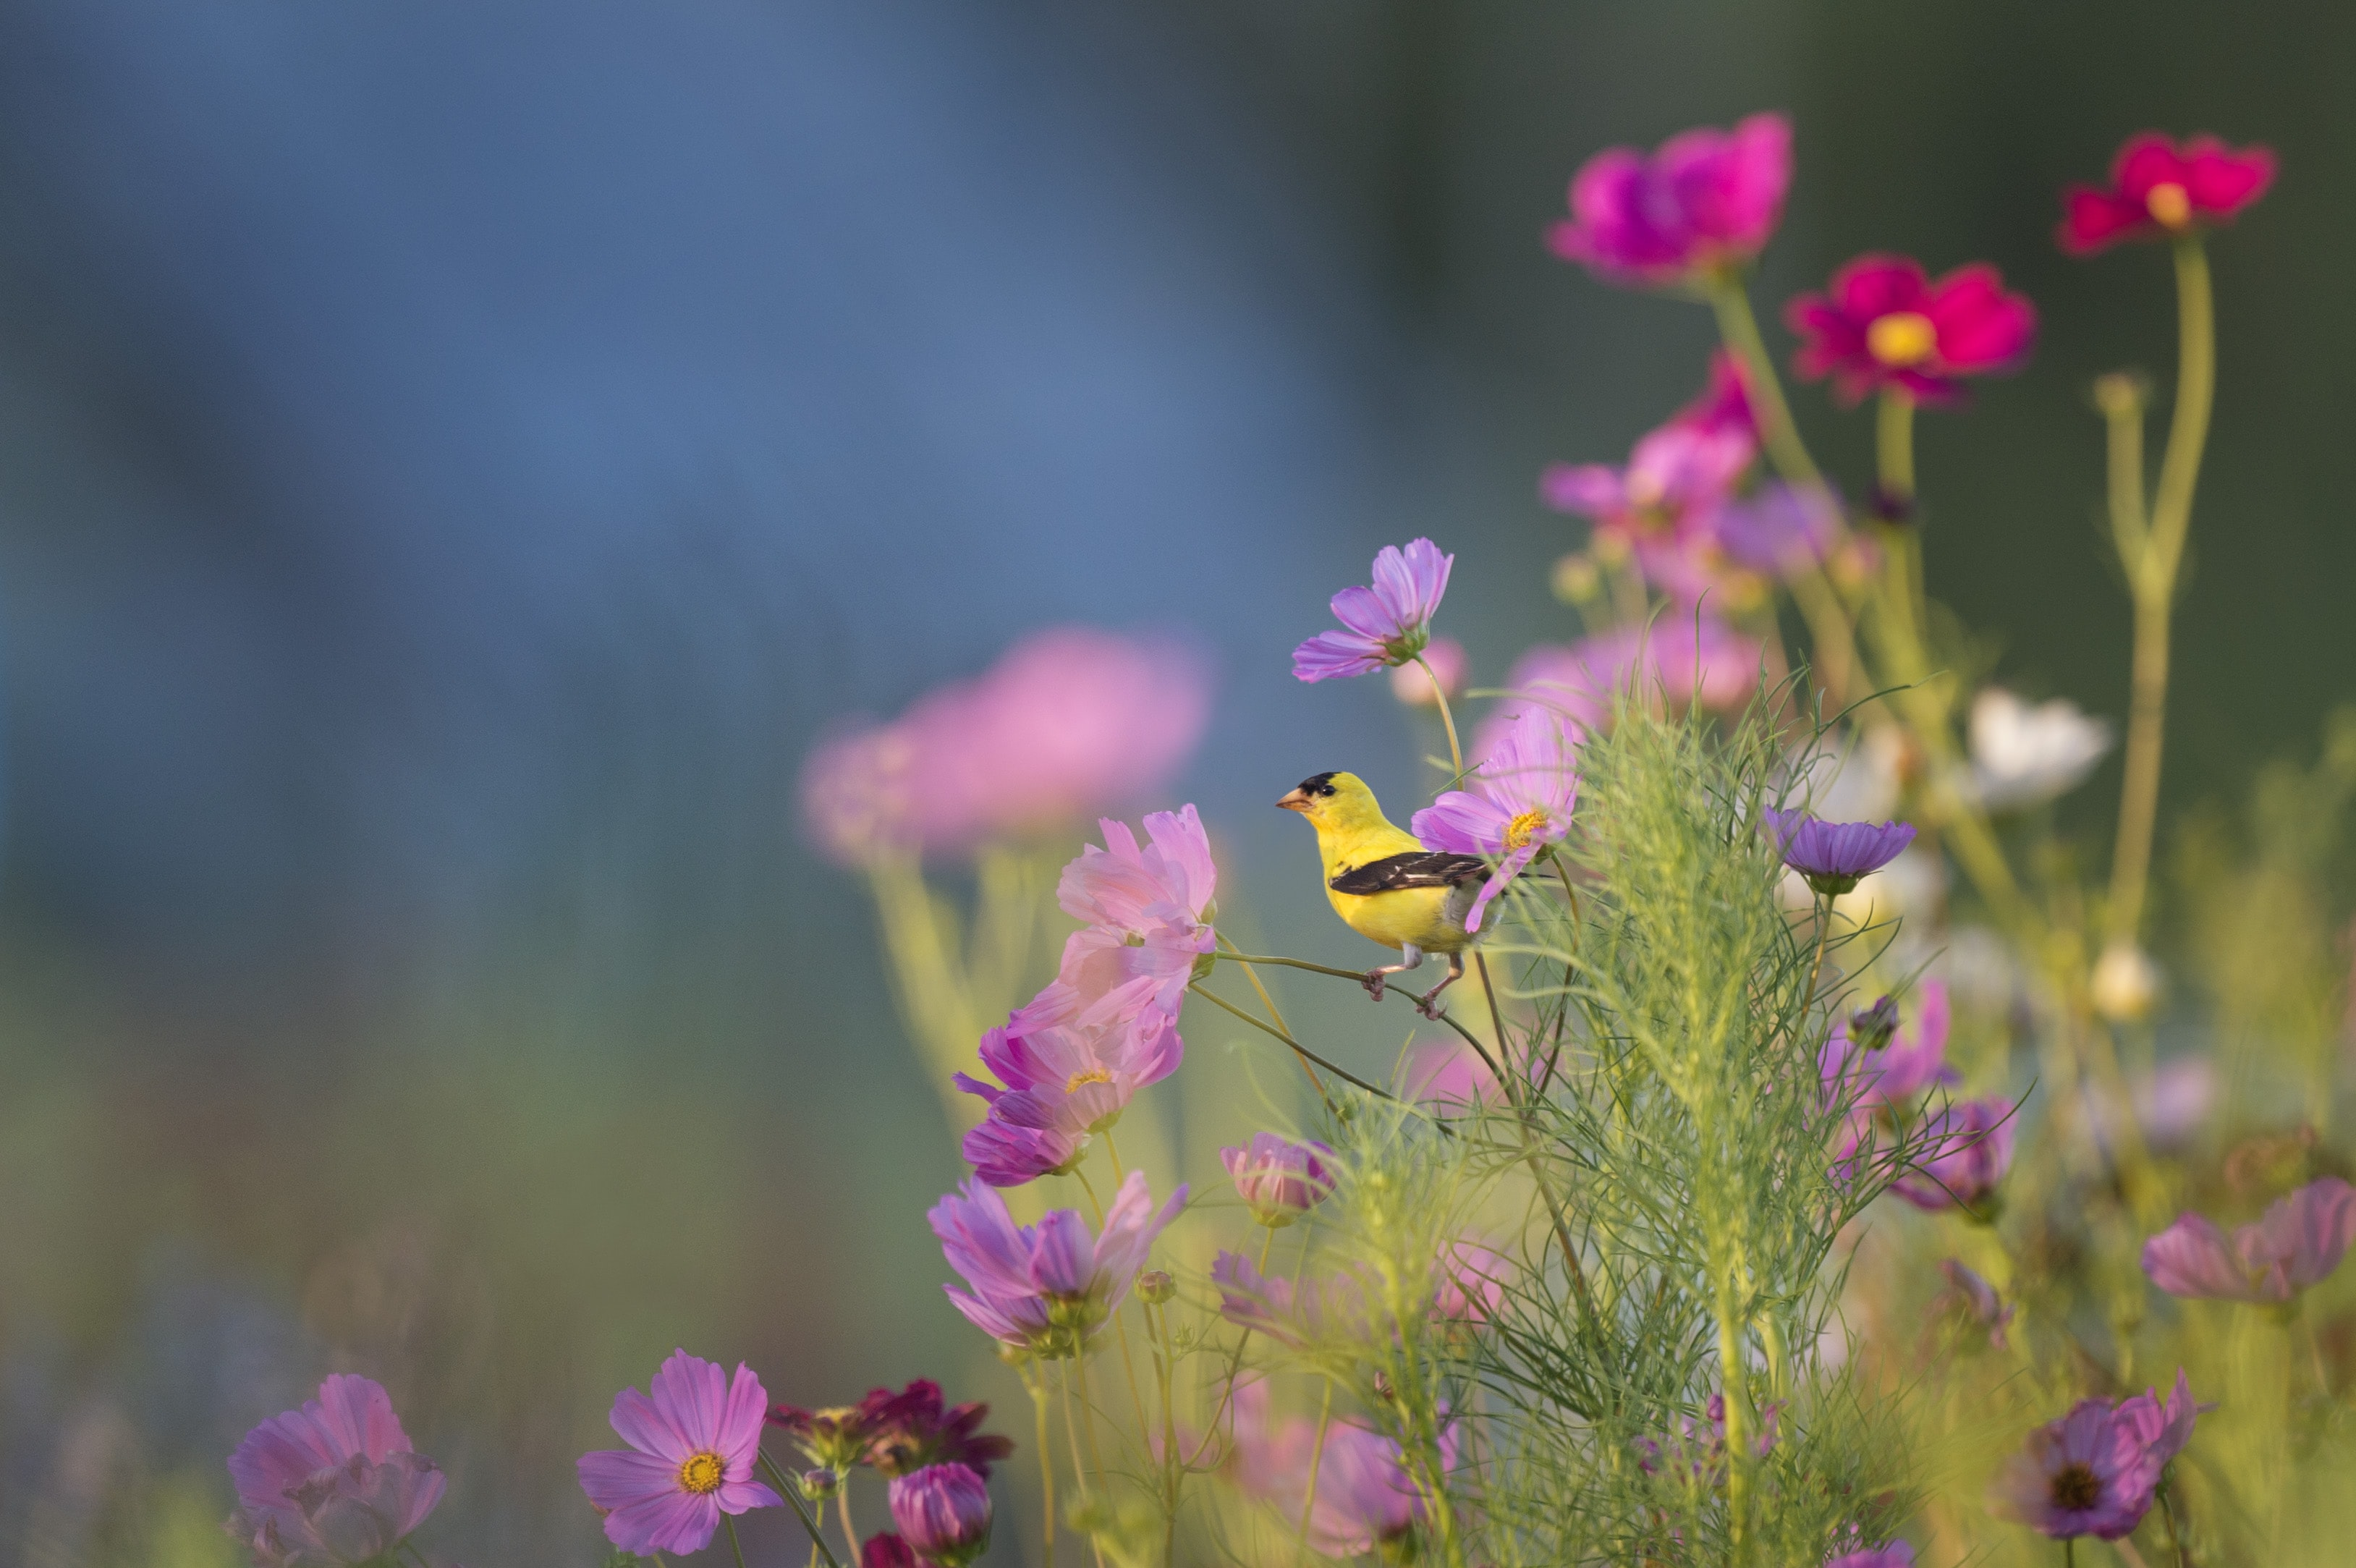 yellow and black bird on flower